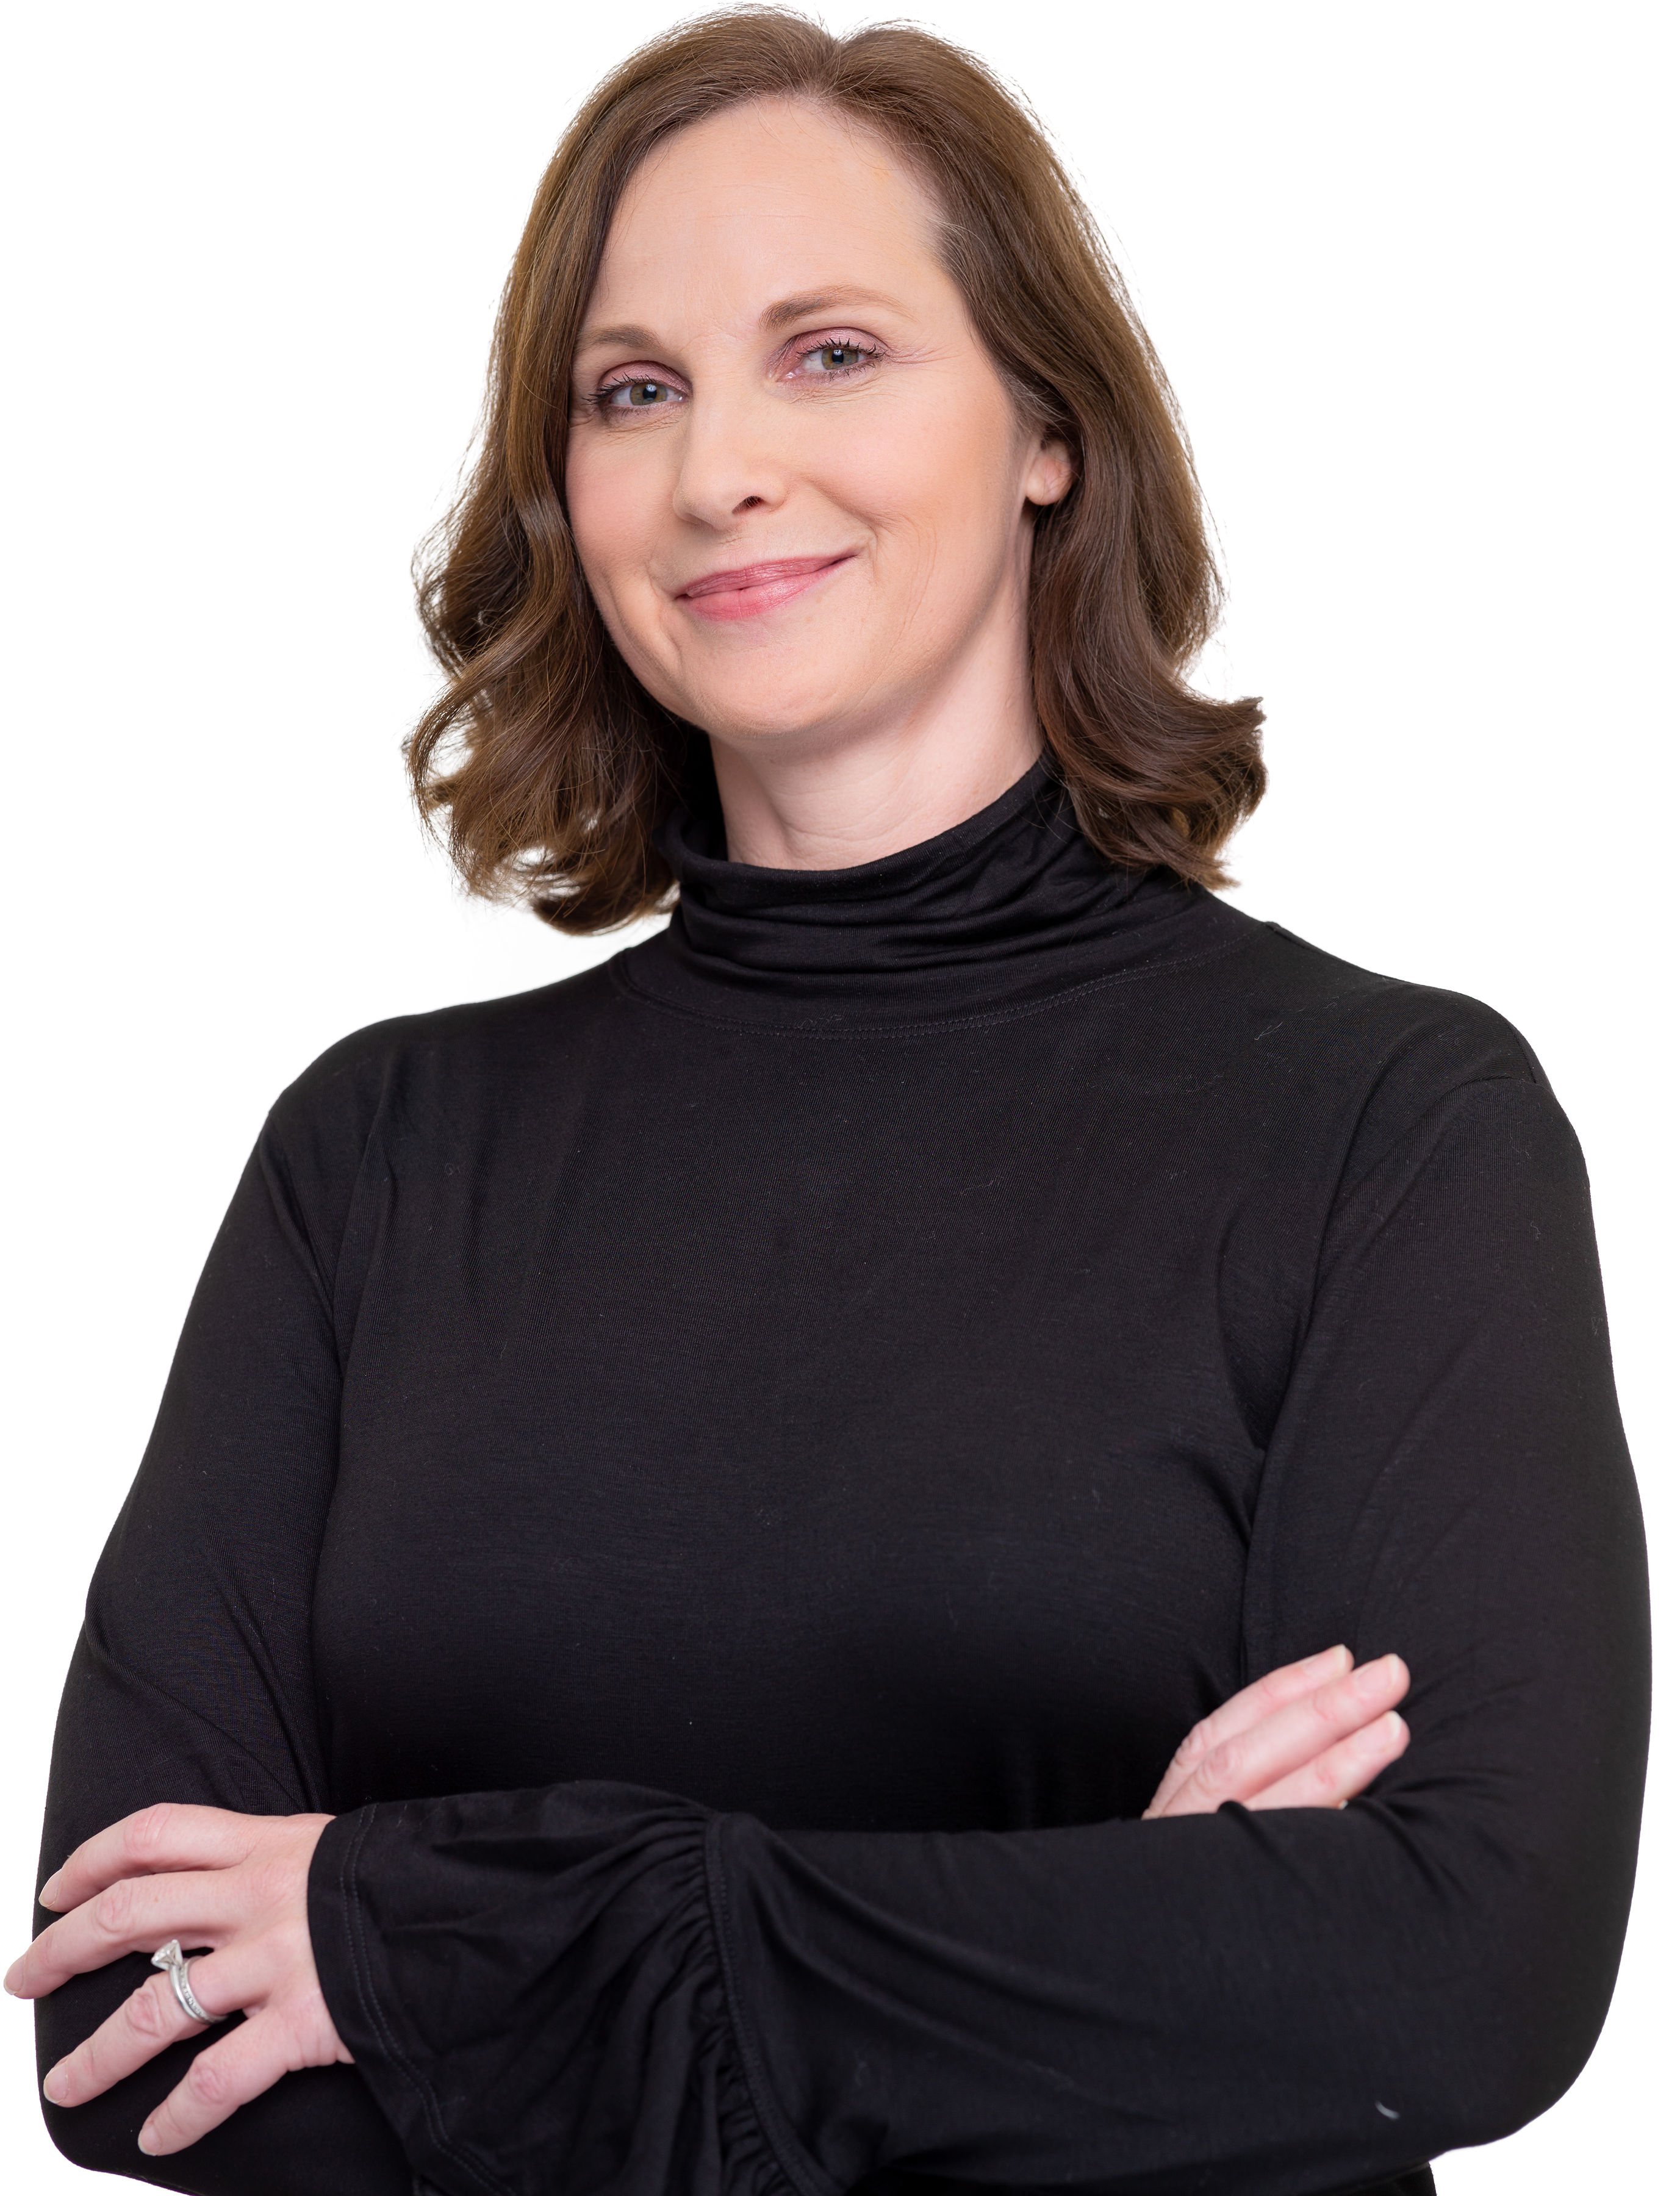 Lisa Alderson